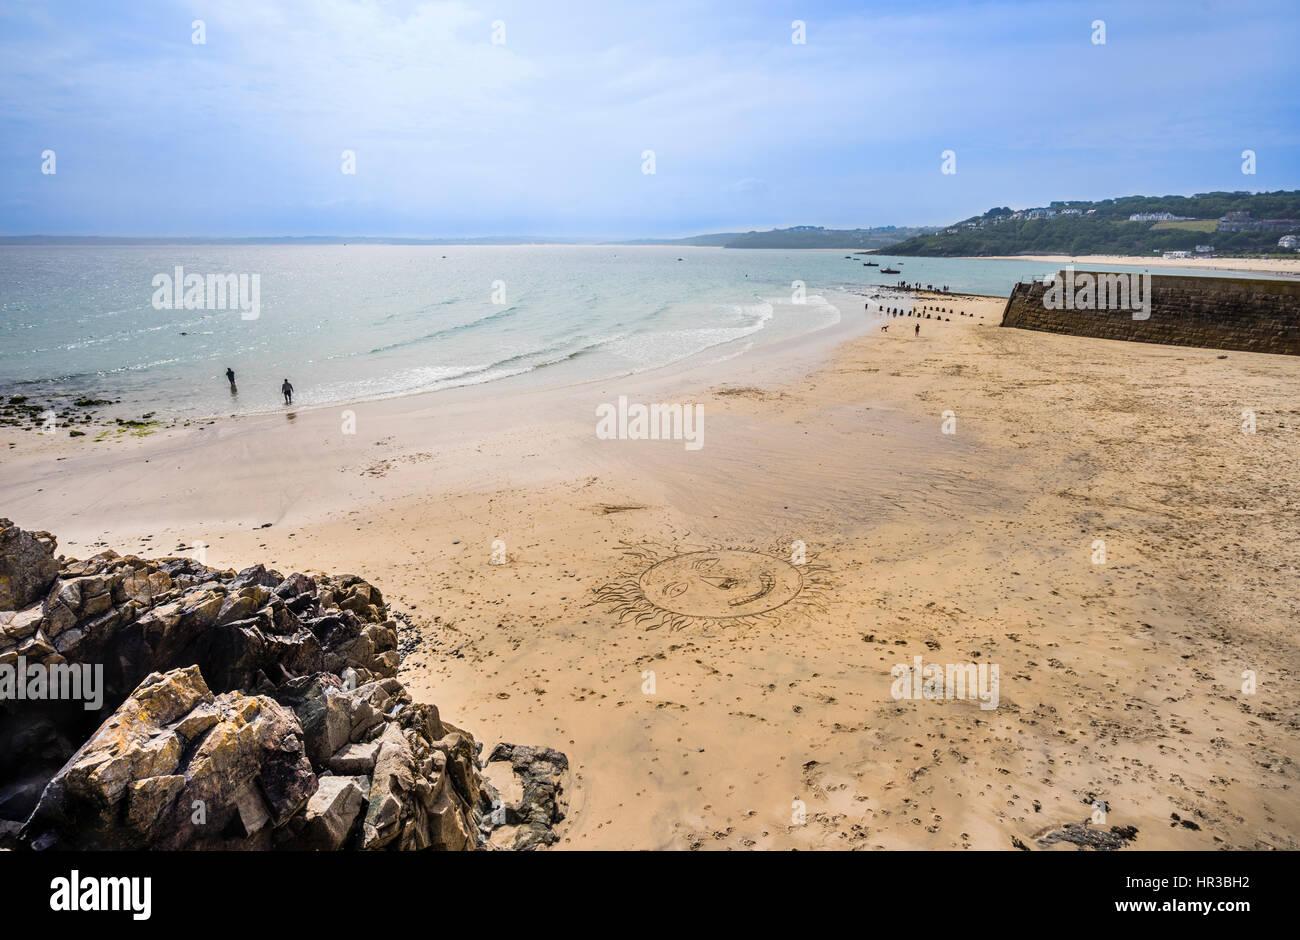 United Kingdom, Cornwall, view of Bamaluz Beach, St Ives - Stock Image